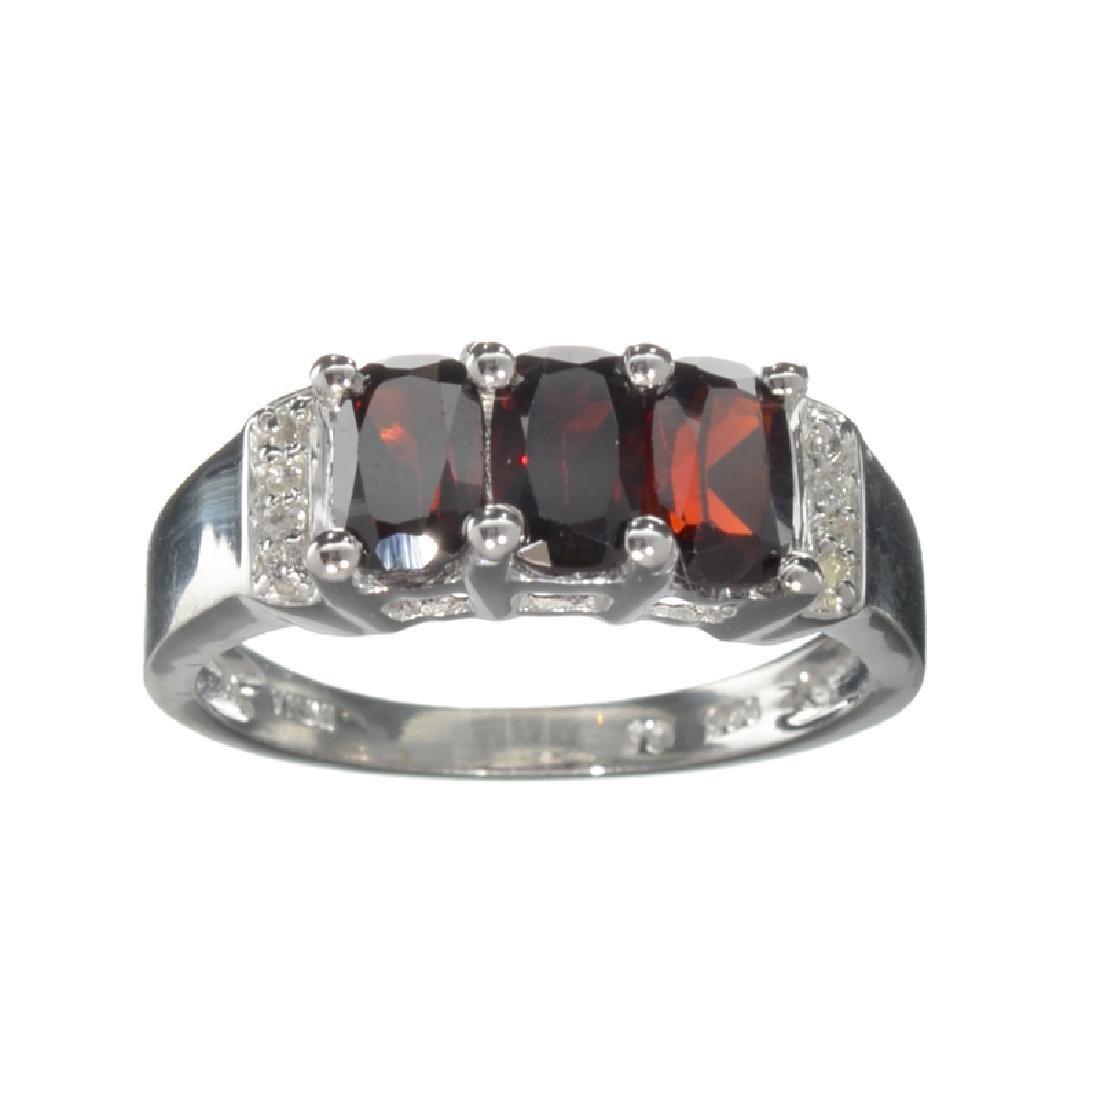 APP: 0.4k Fine Jewelry 1.84CT Almandite Garnet And